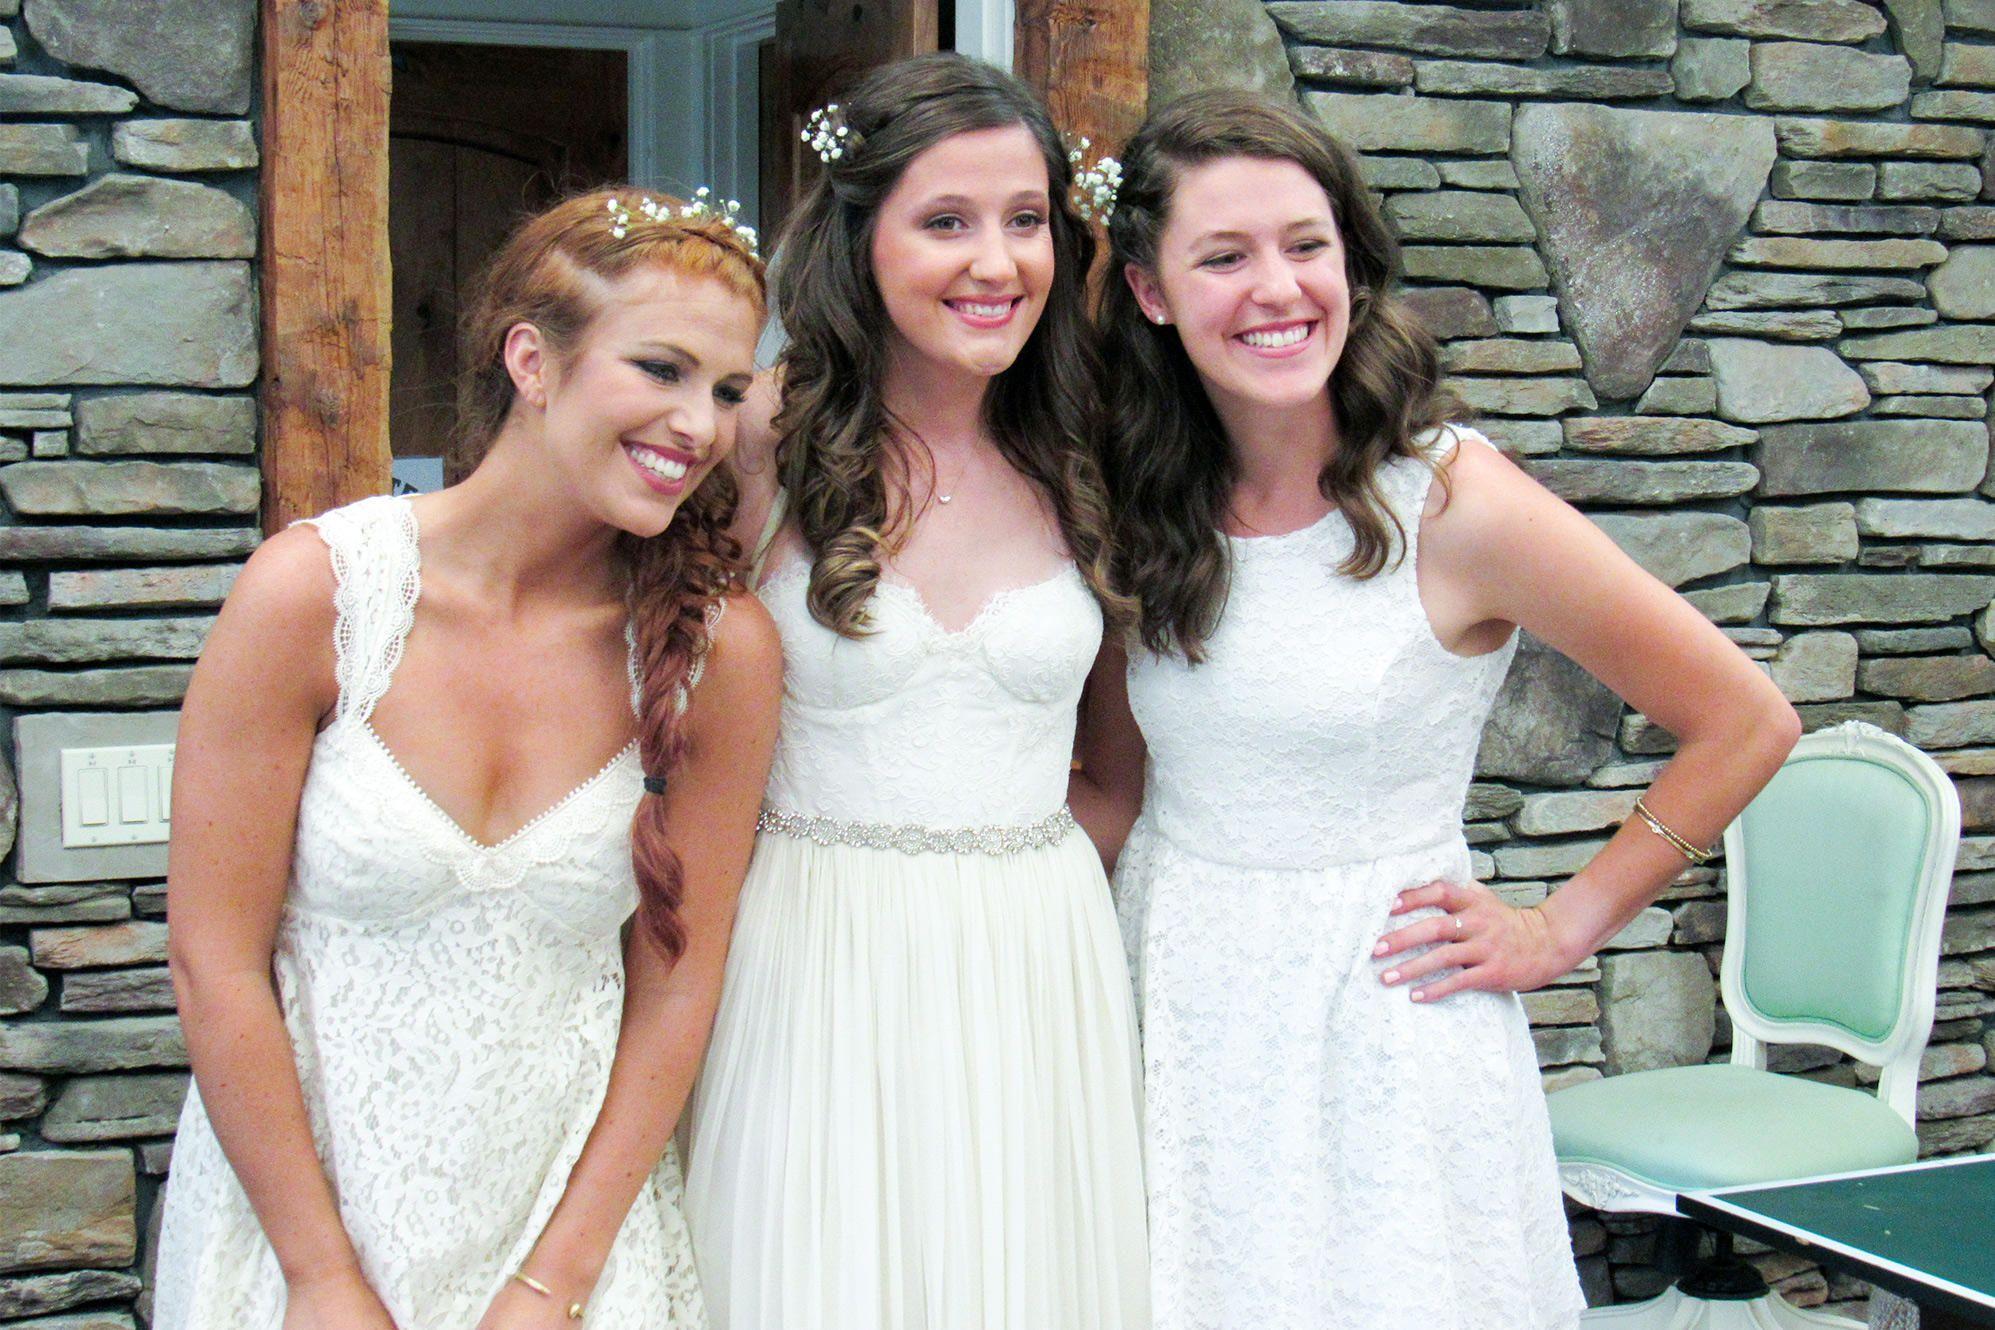 Tlc Official Site Little People Big World Brides And Bridesmaids Wedding Album